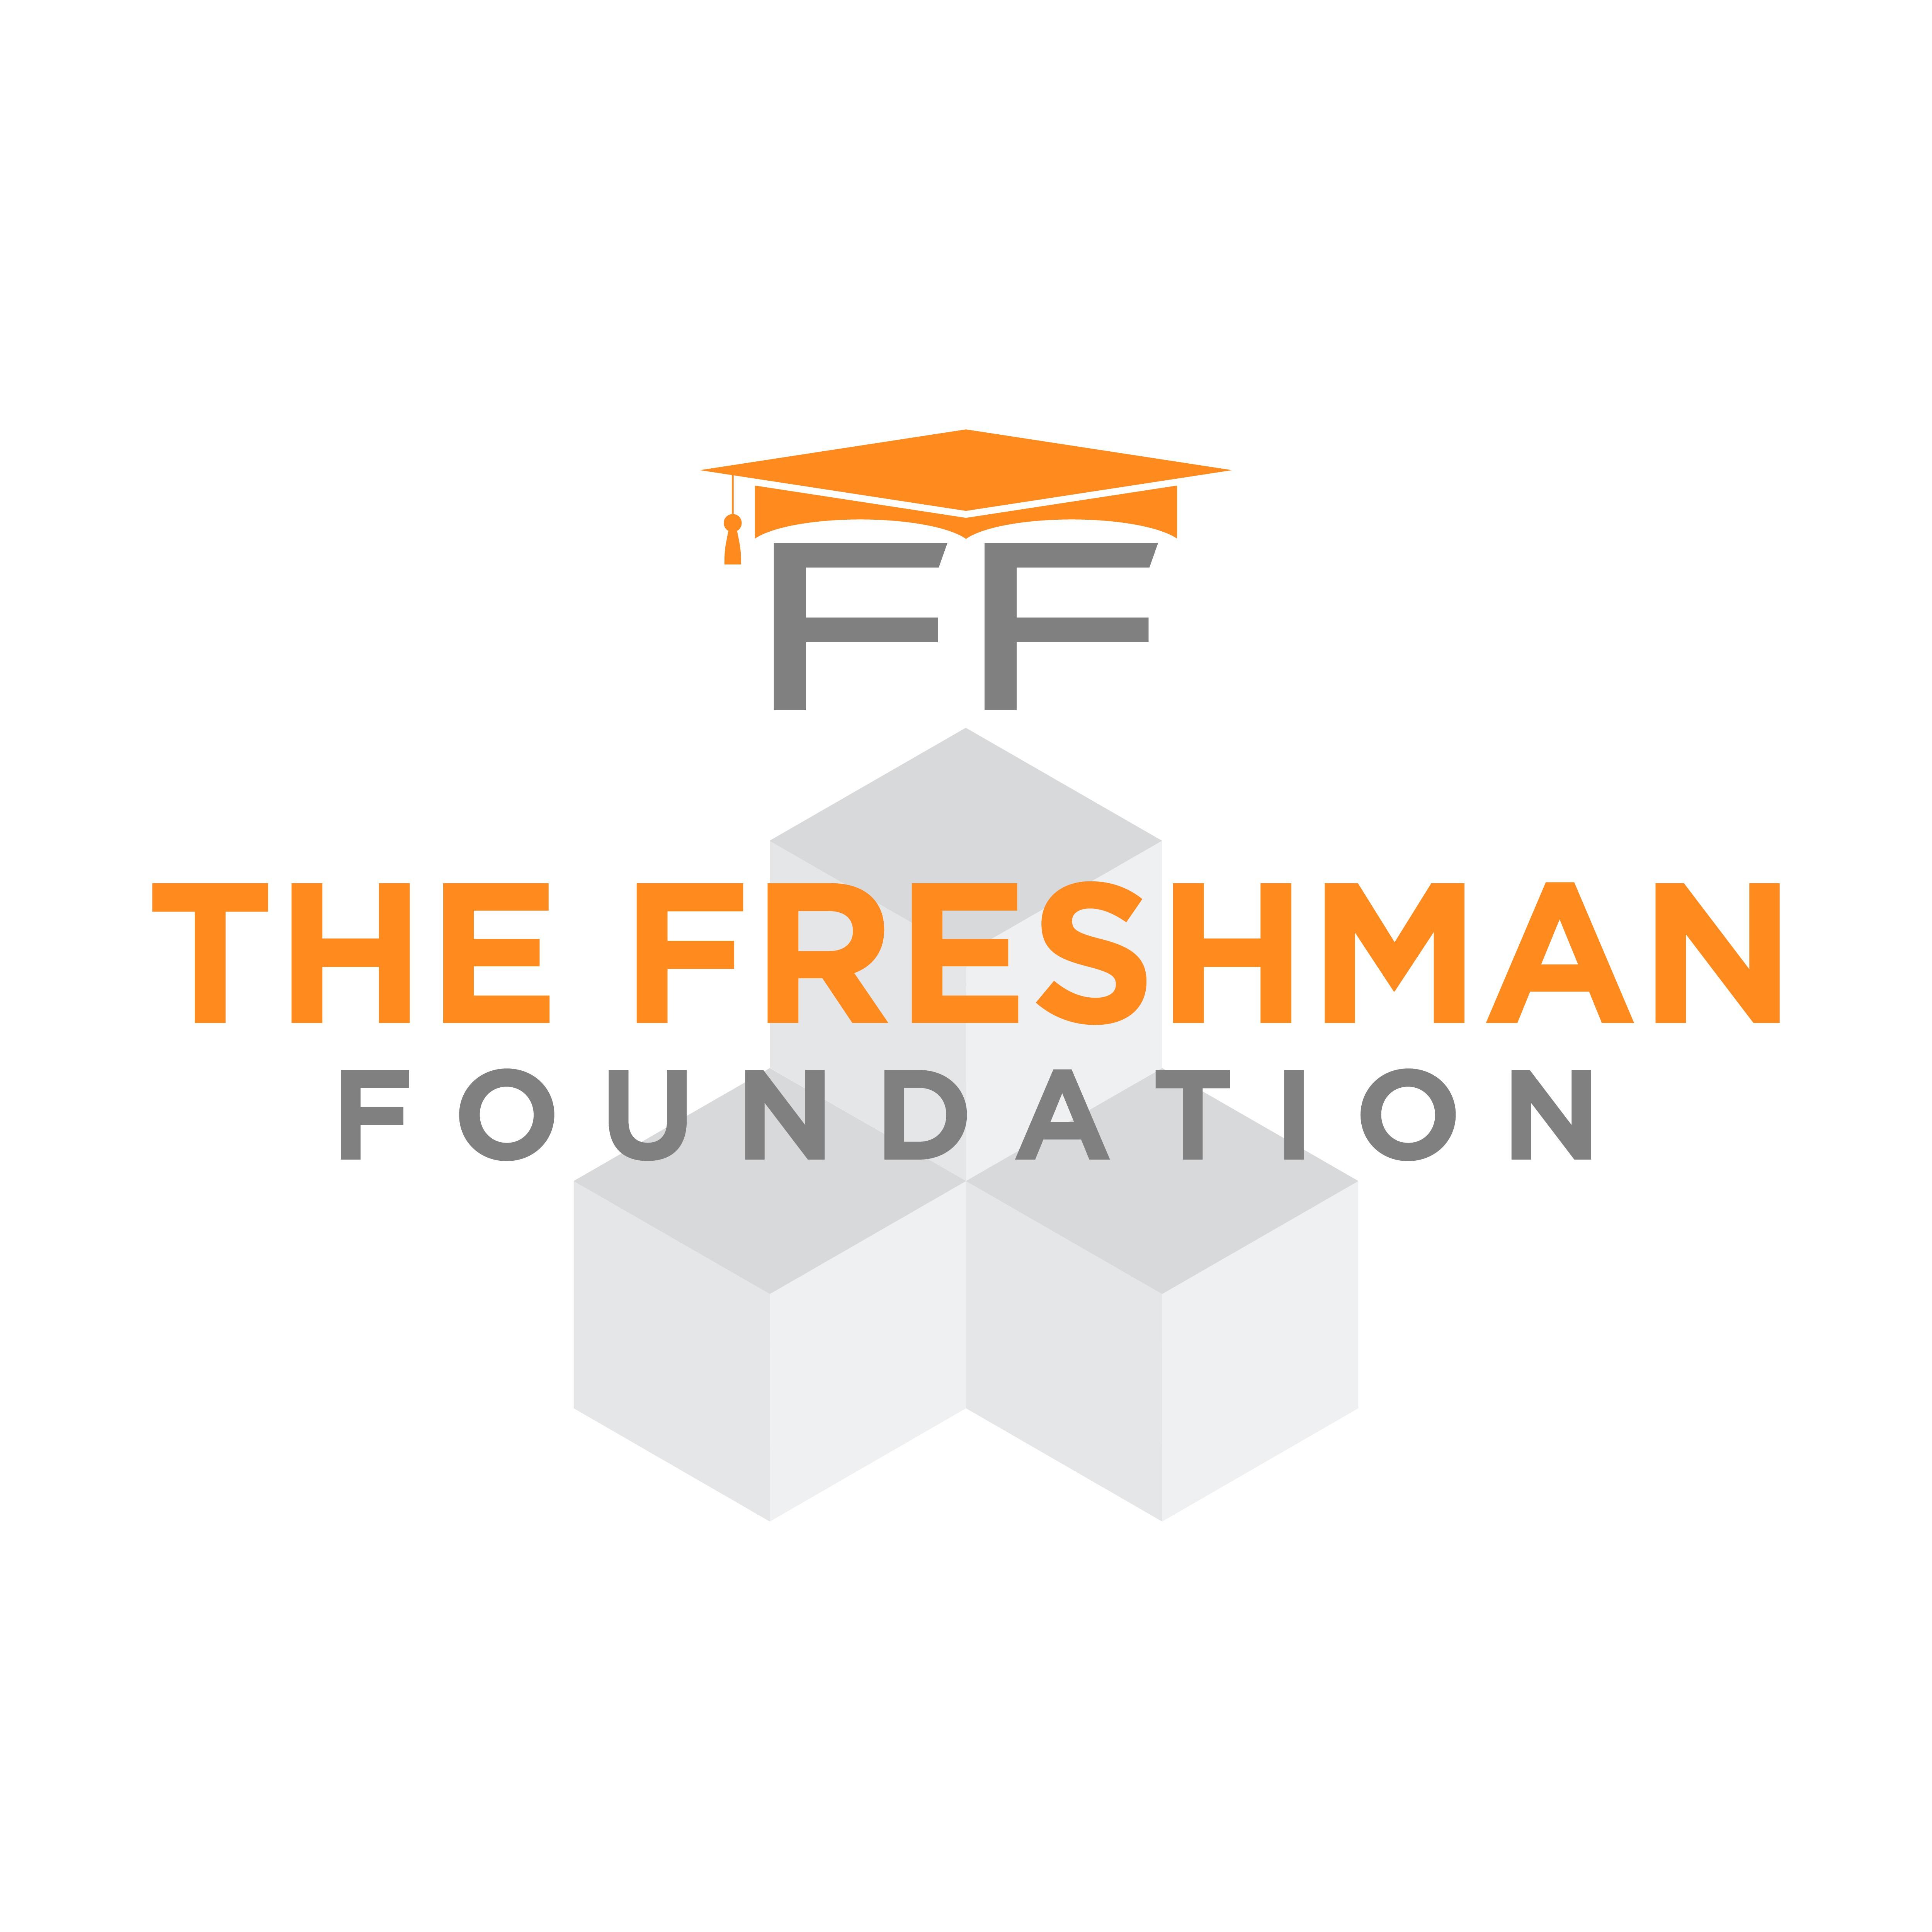 Eye-catching logo for coaching business targeting high school athletes